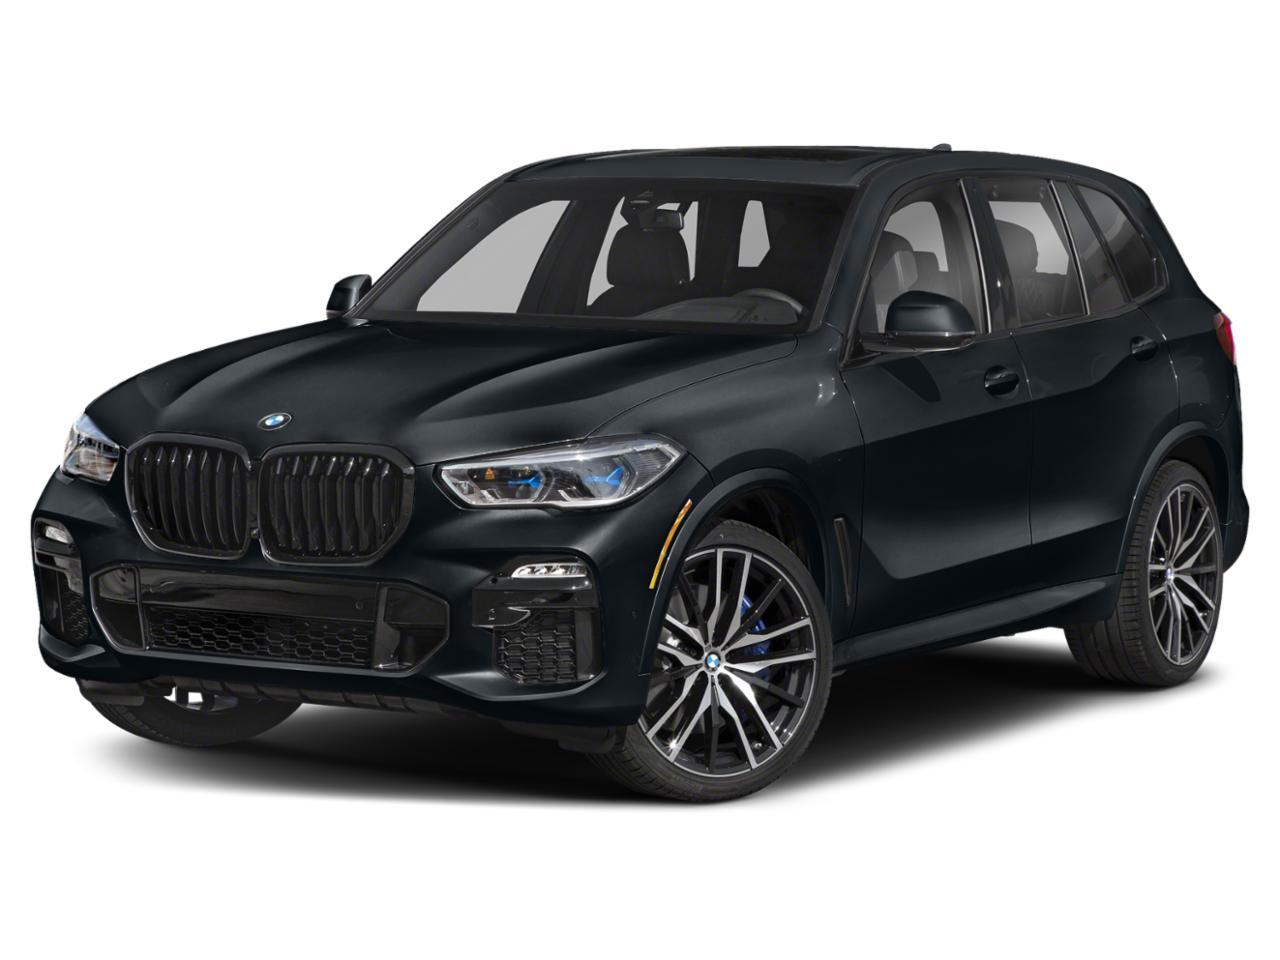 2020 BMW X5 M50i Vehicle Photo in Charleston, SC 29407